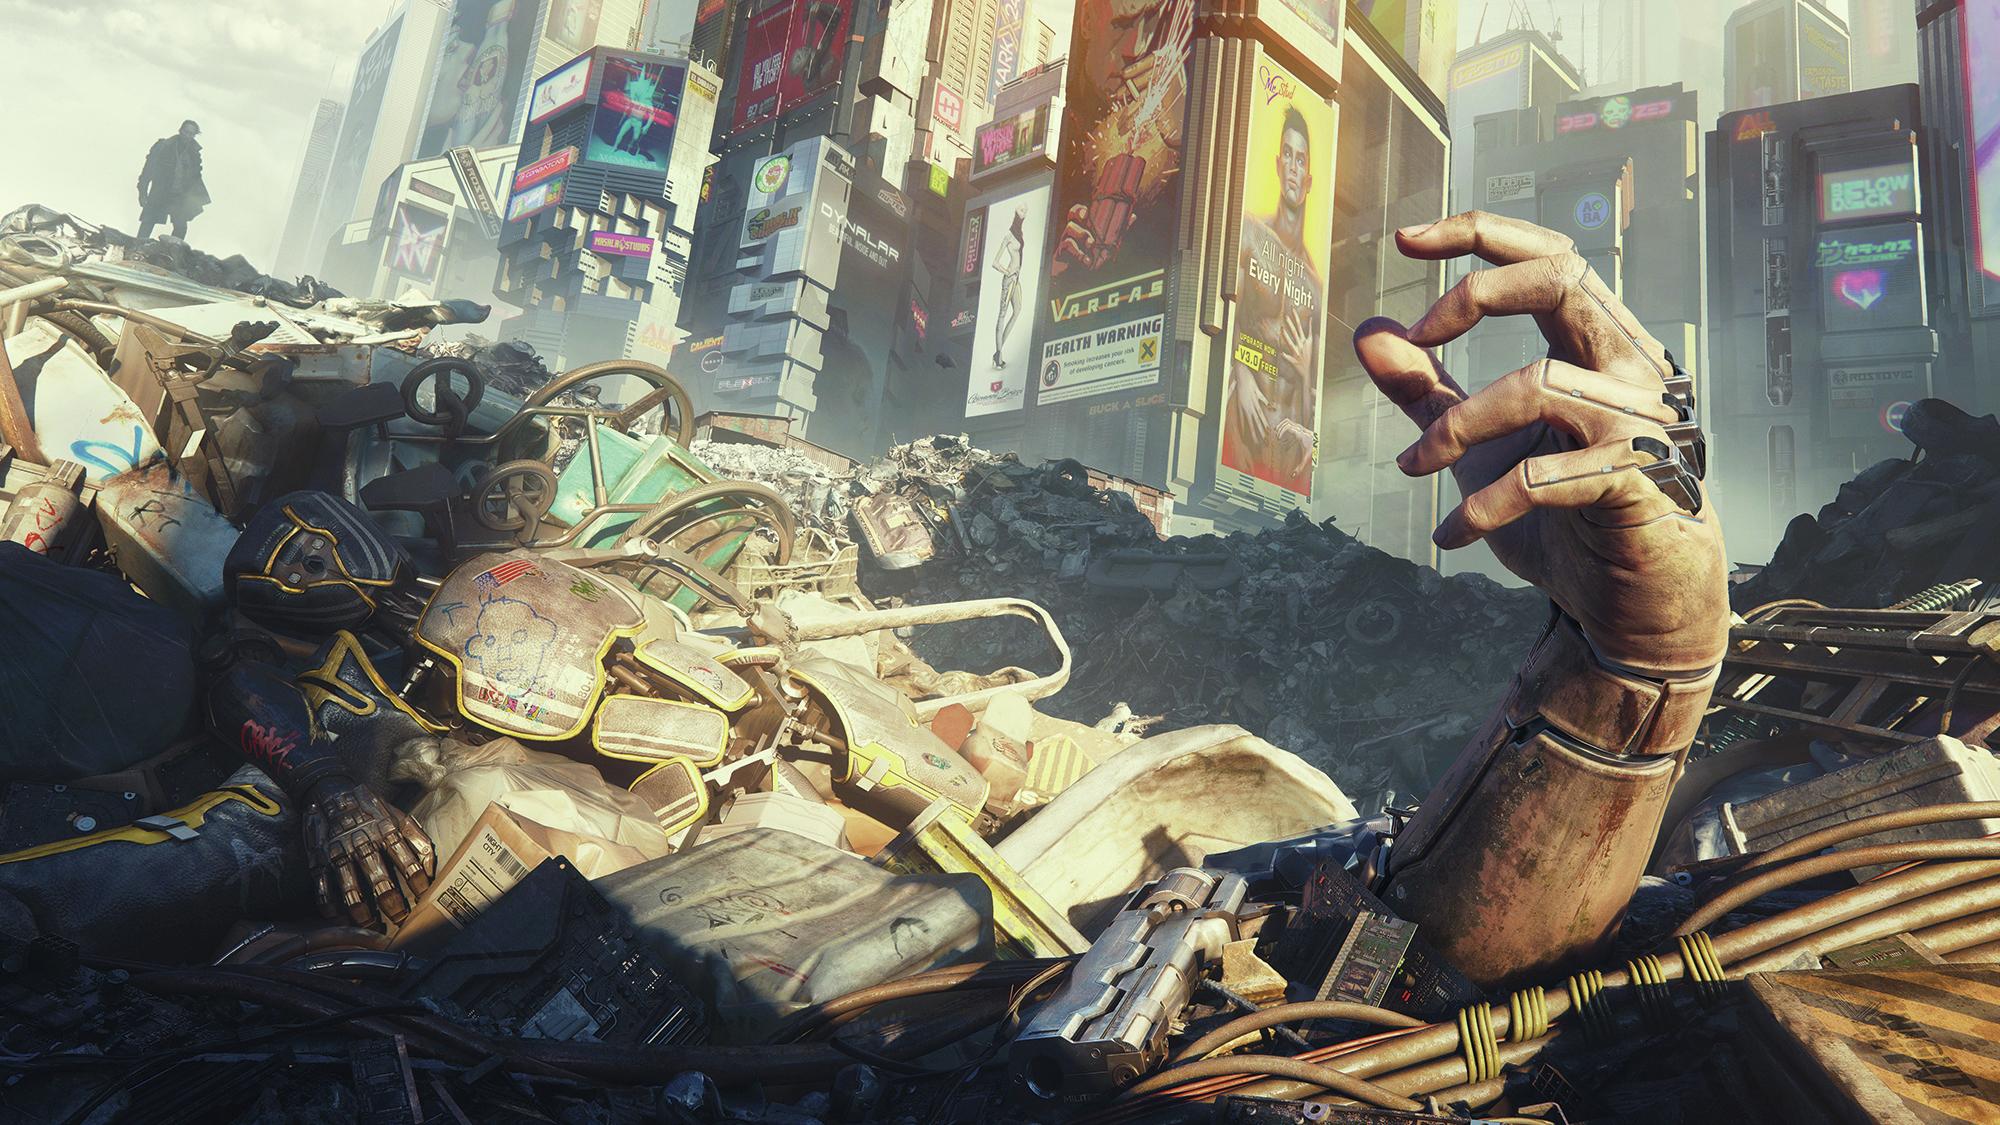 A cyborg hand sticking out of a trash heap.